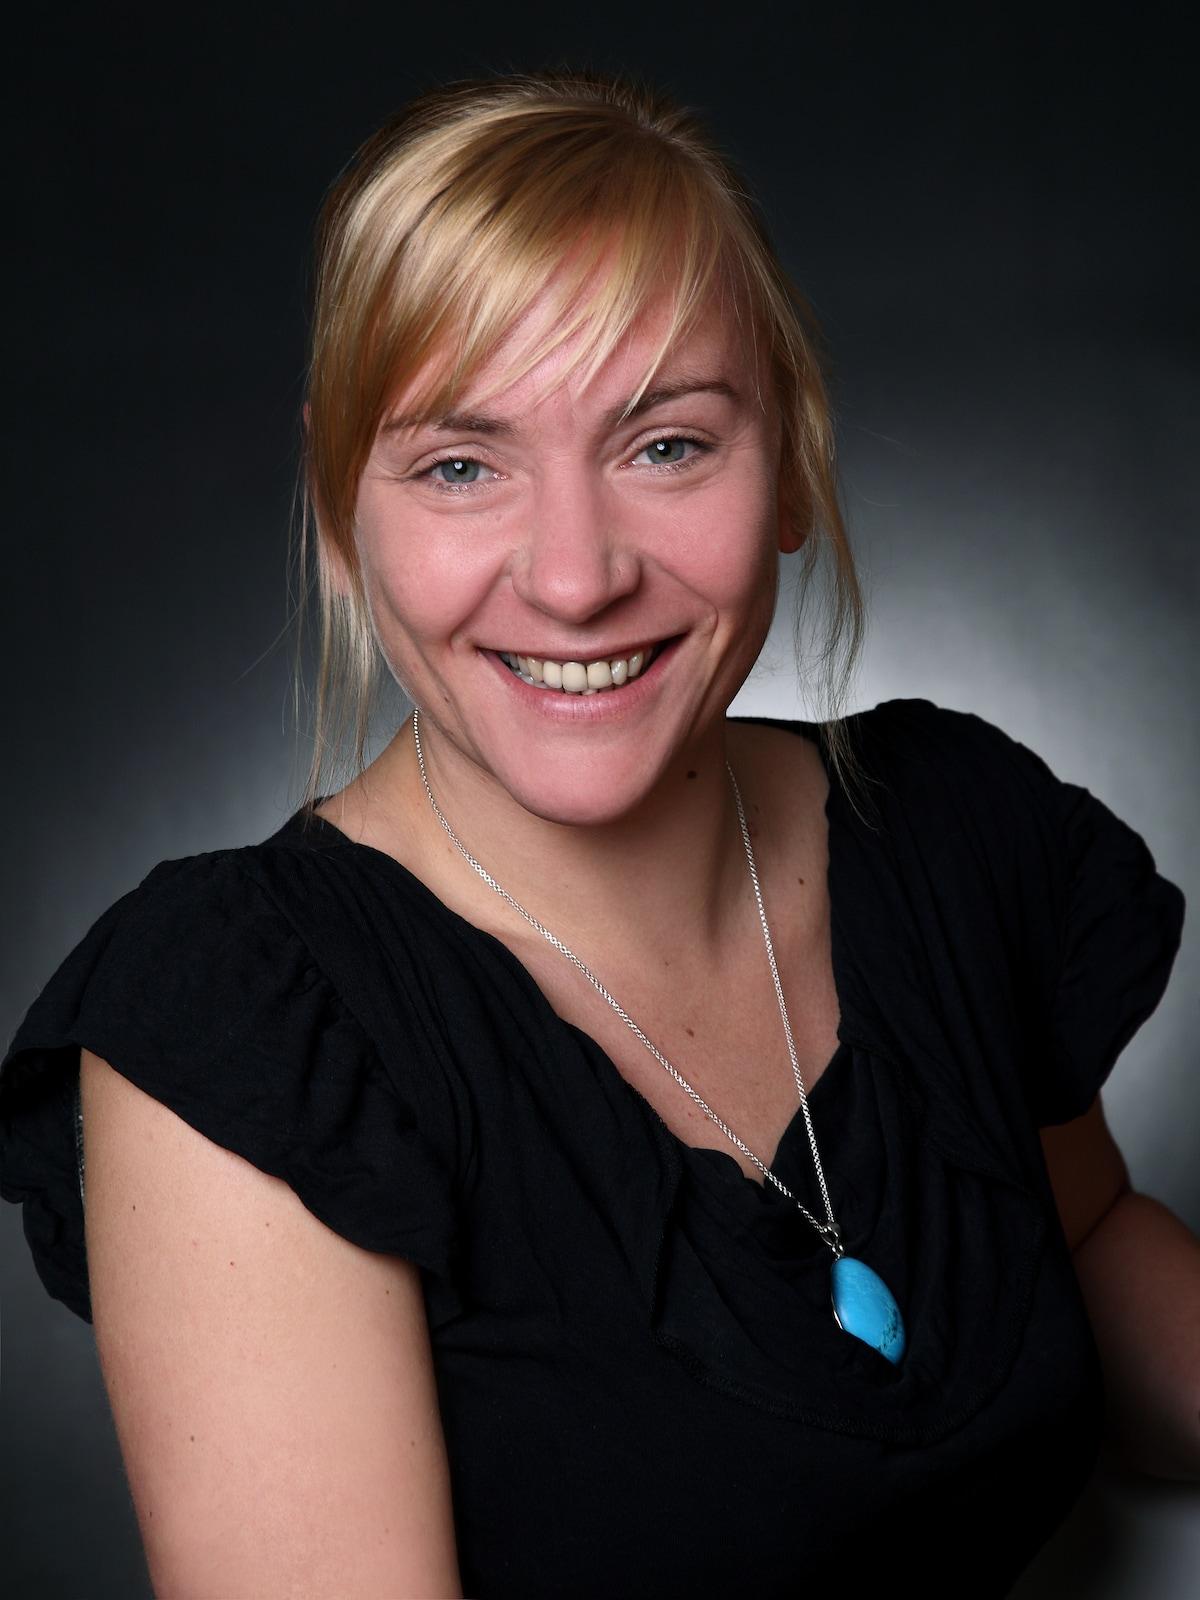 Anett Charlott